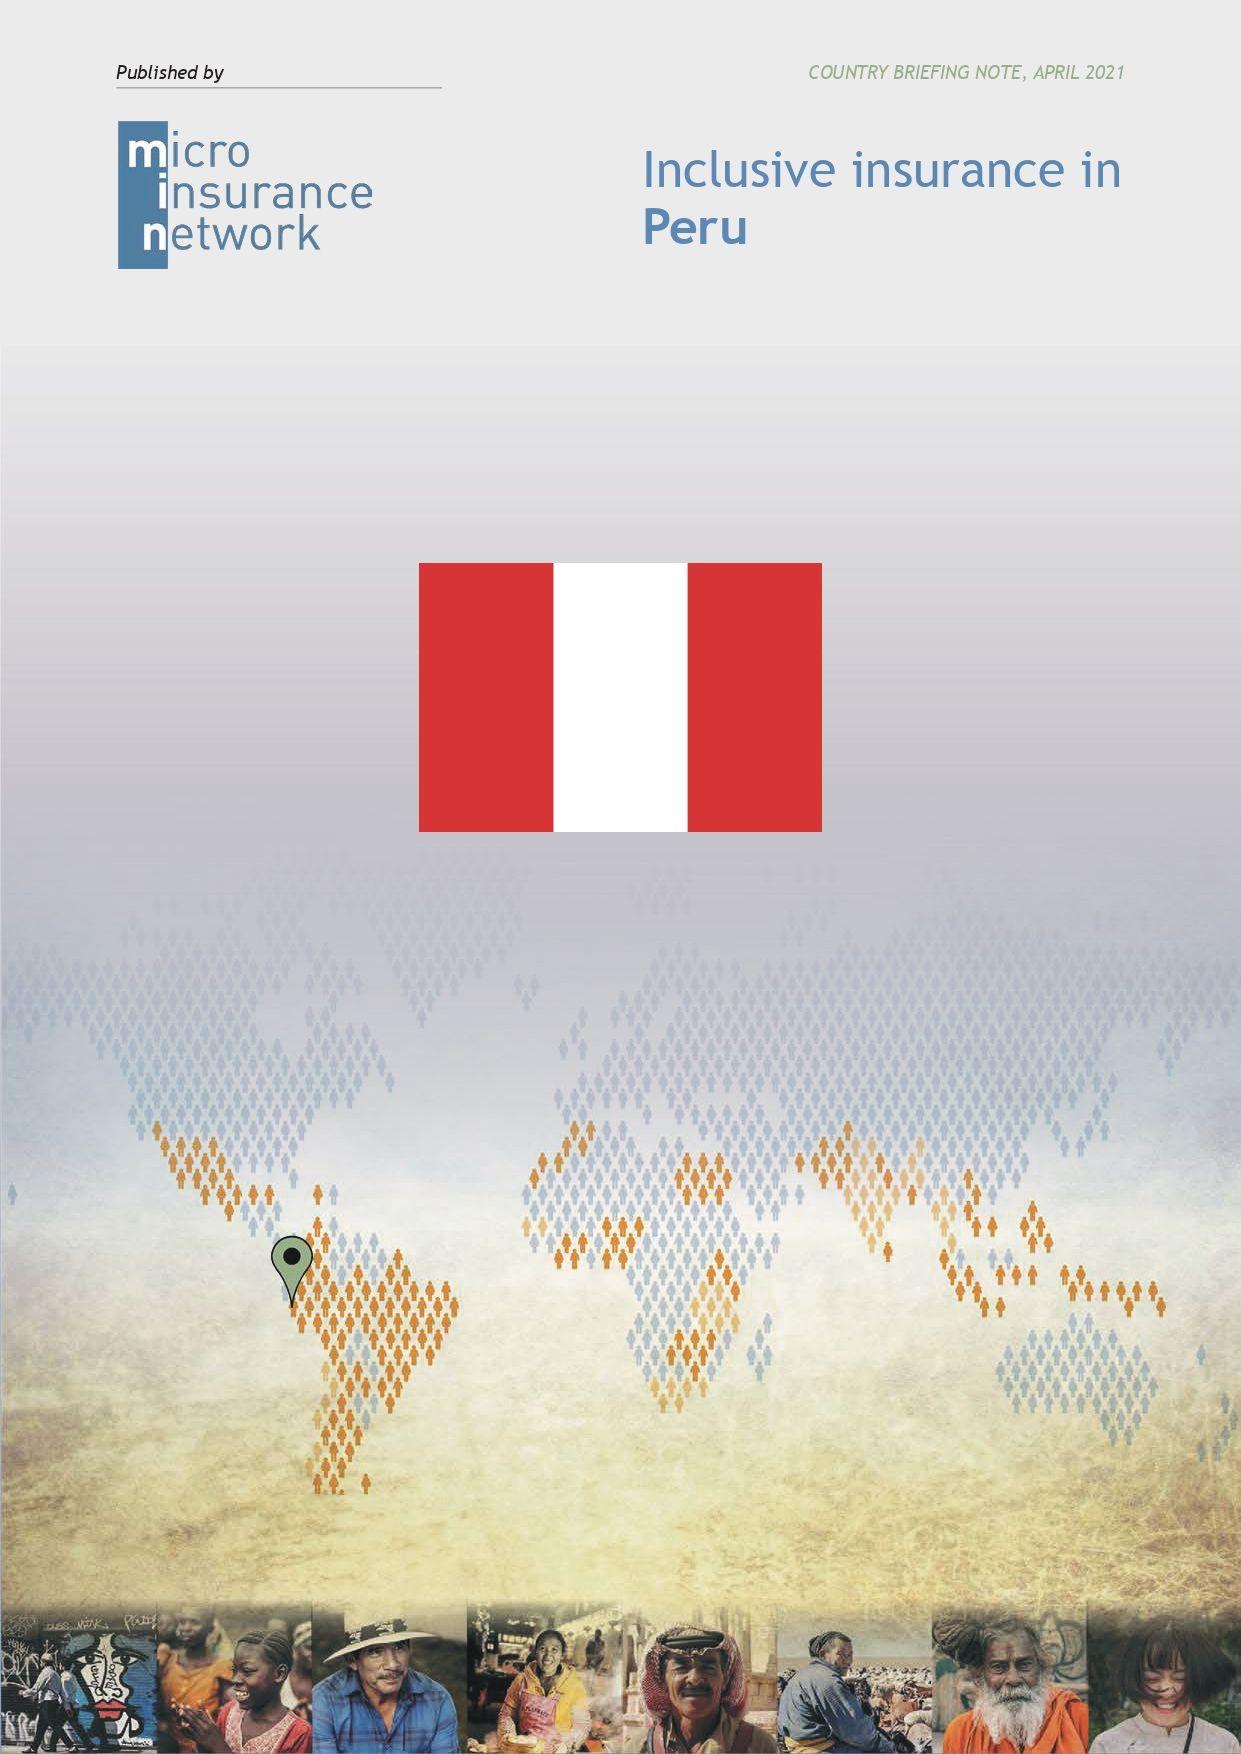 Peru EN_vf-1 (1)_page-0001.jpg